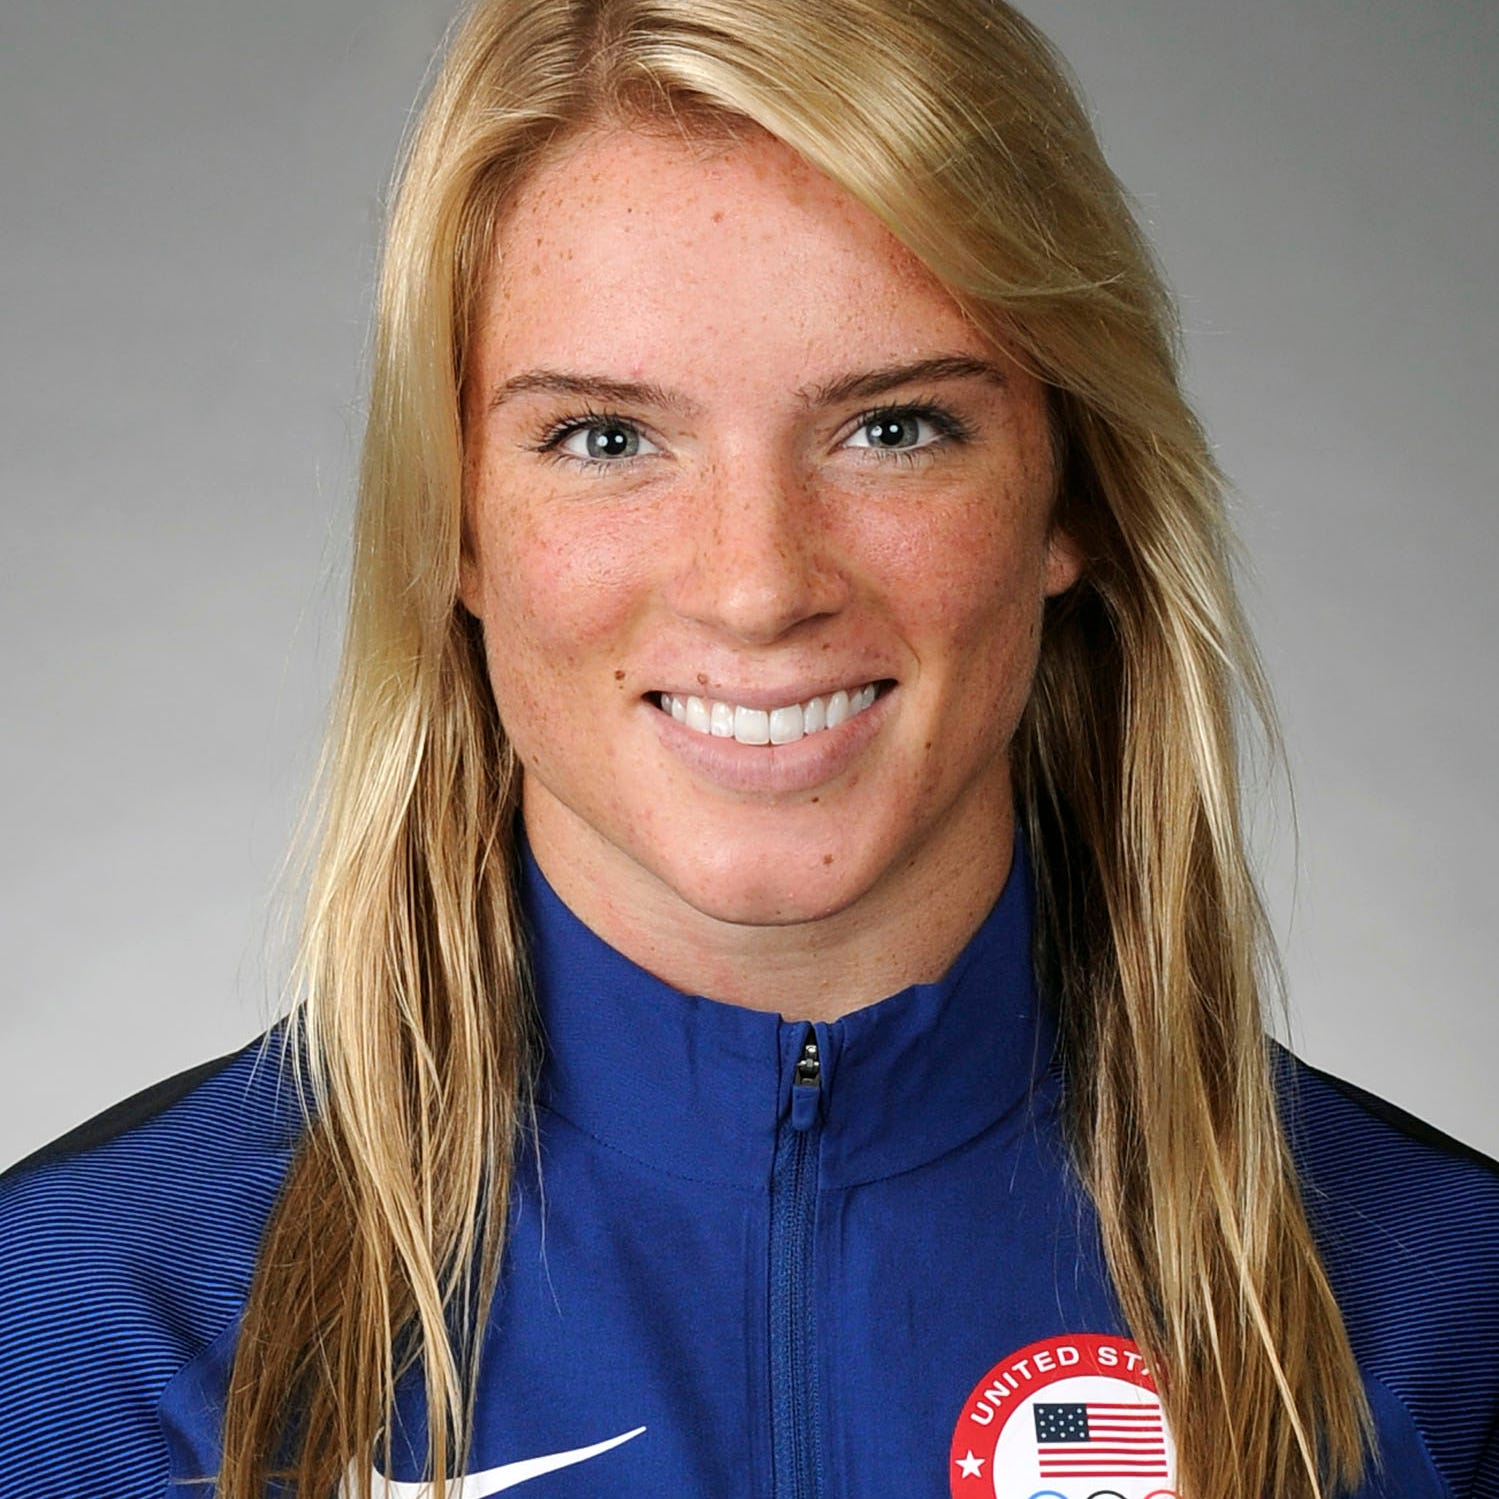 Katrina Young